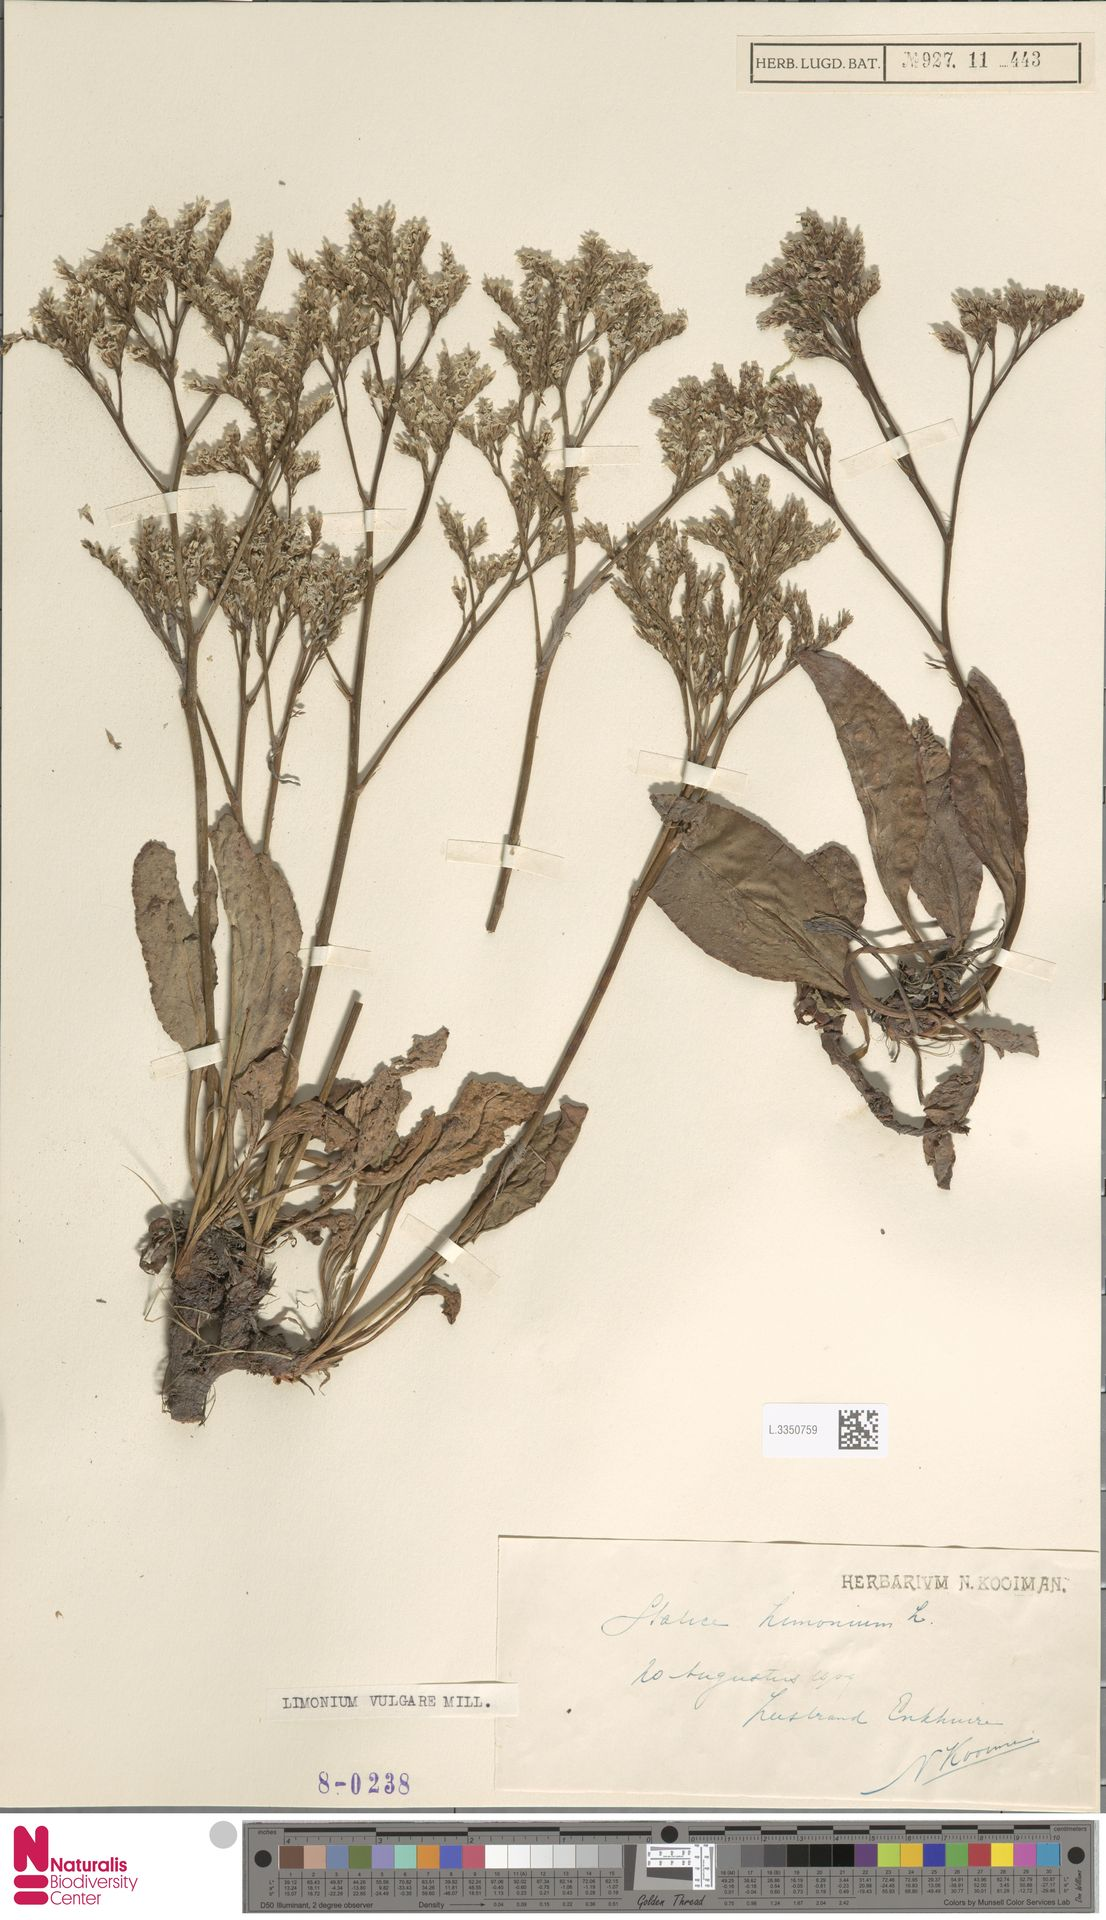 L.3350759 | Limonium vulgare Mill.